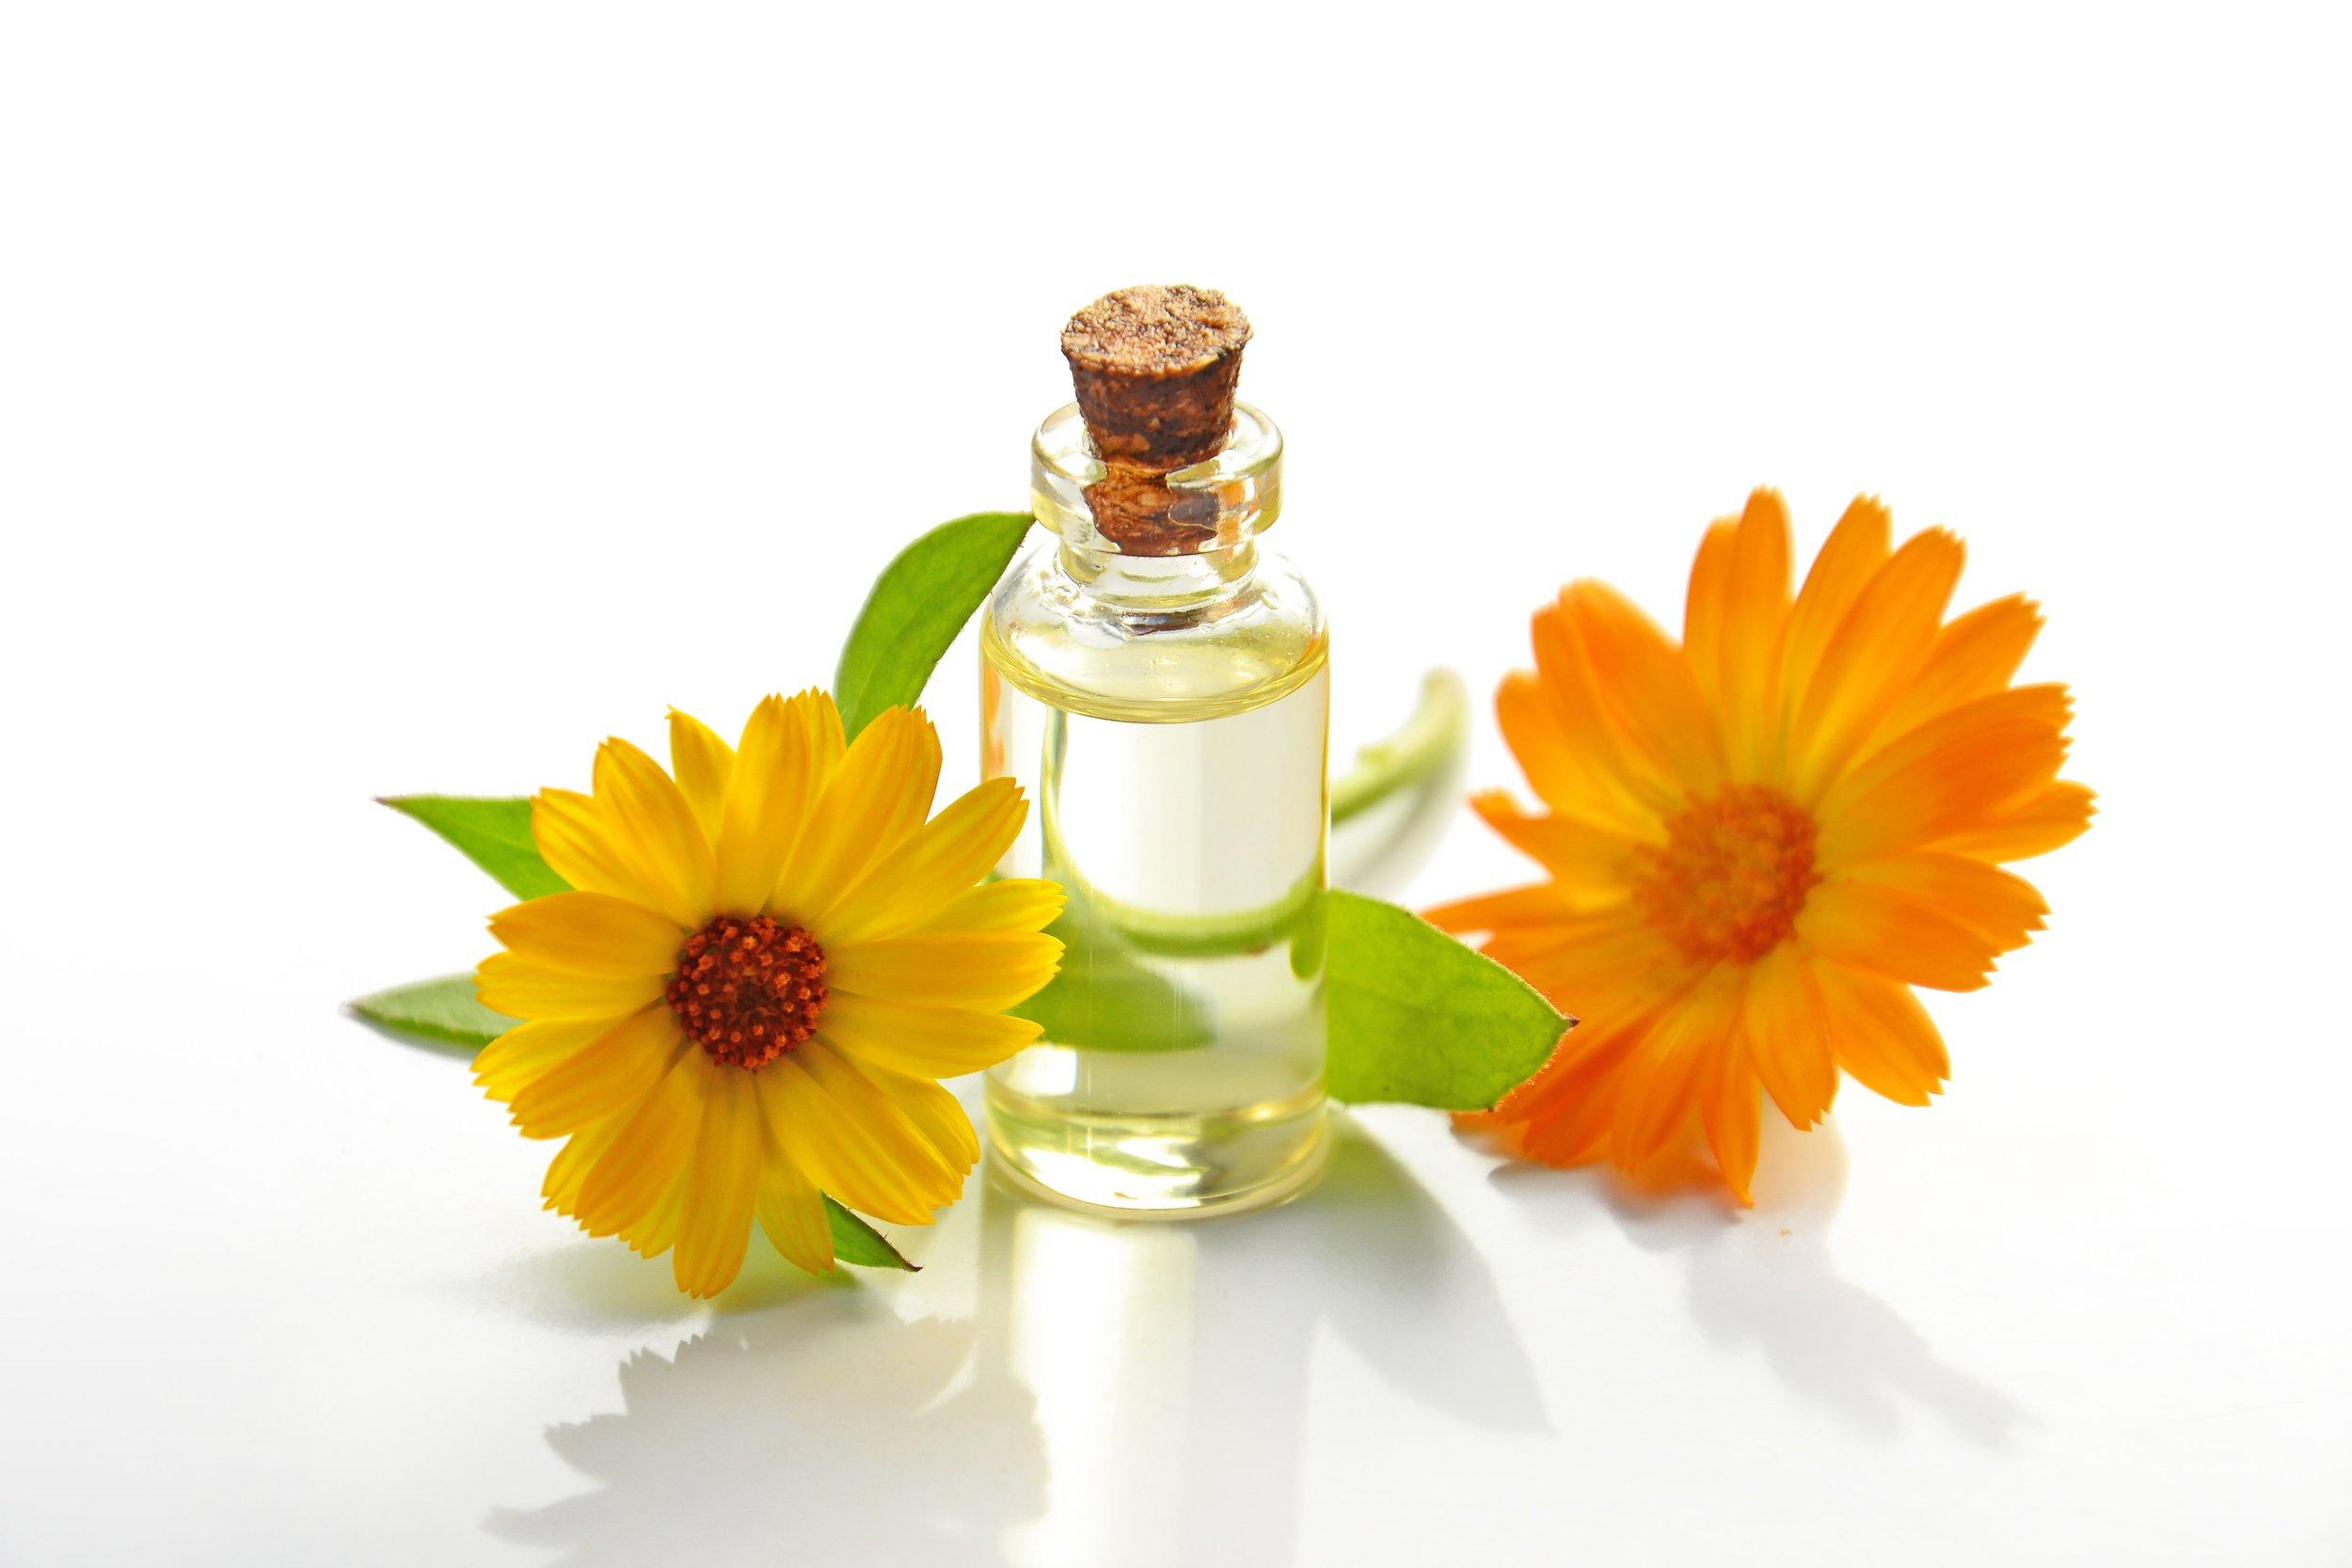 aromatherapy-bottle-bright-932587.jpg